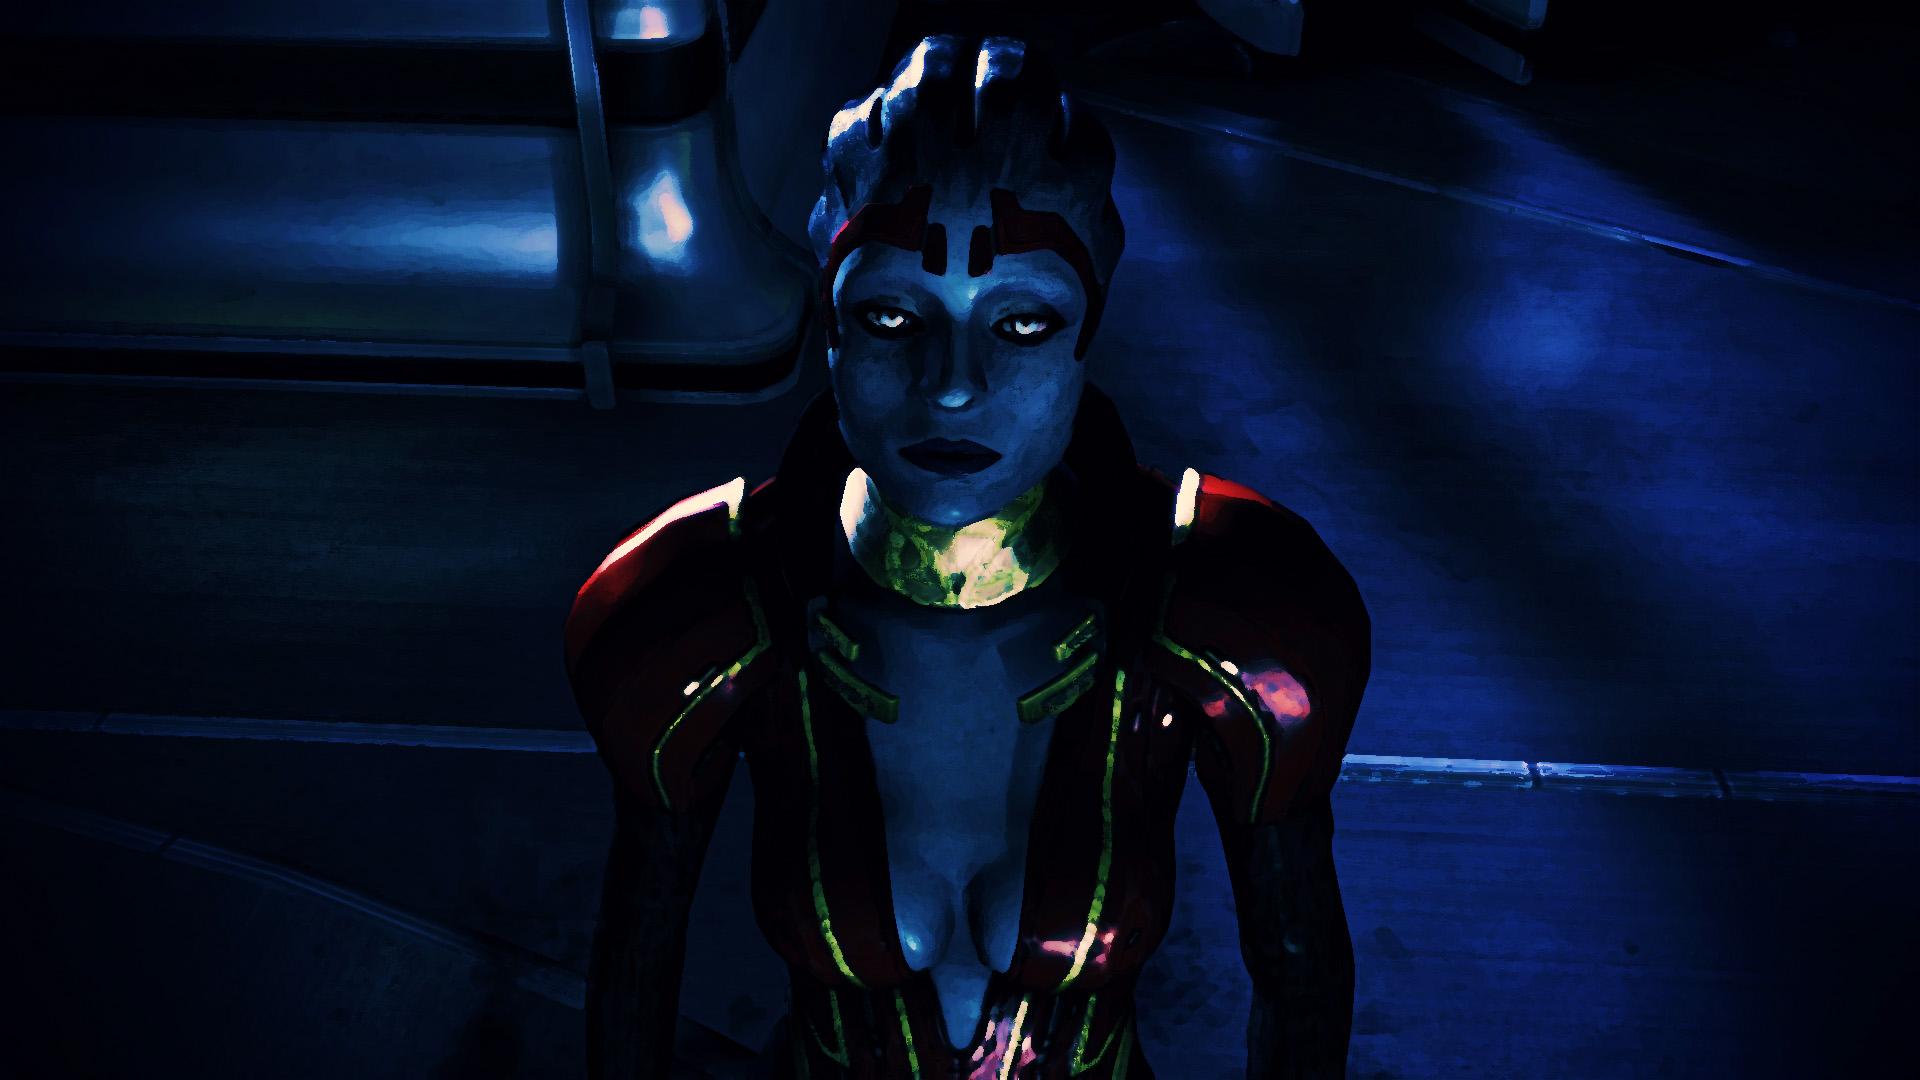 Mass Effect 3: Samara 2 by Lootra